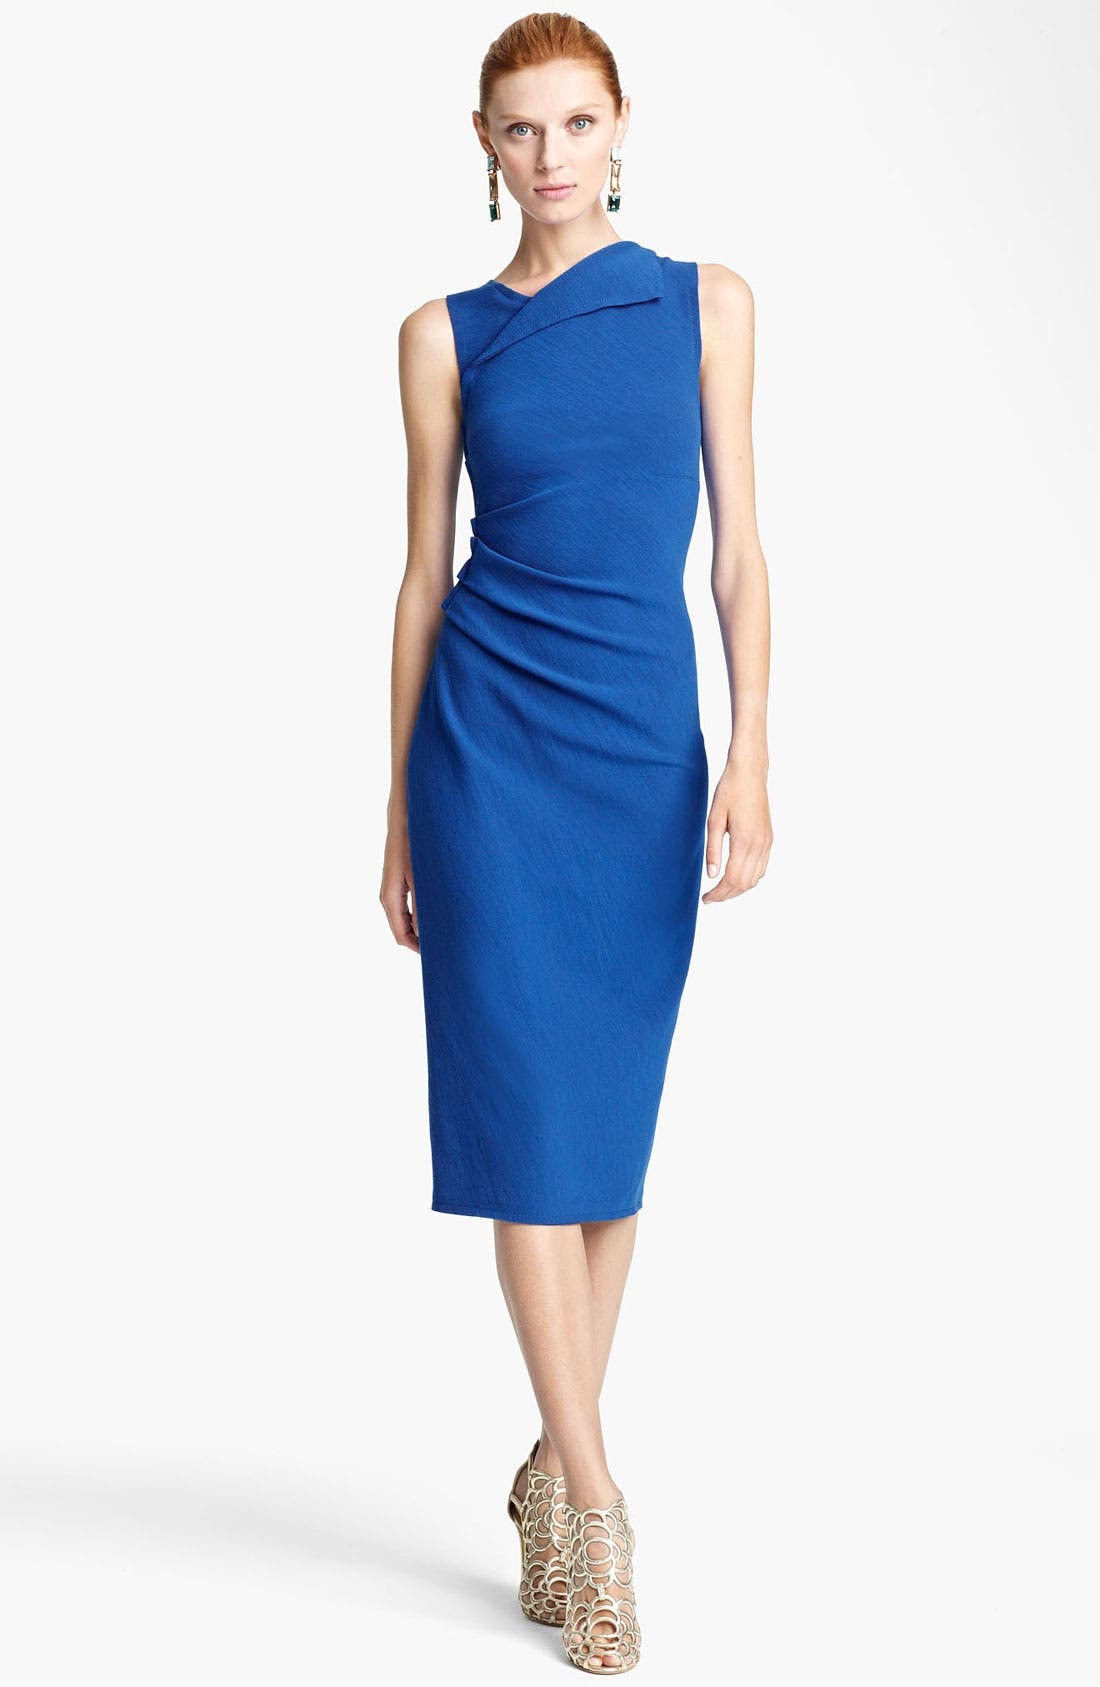 Alternate Image 1 Selected - Oscar de la Renta Ruched Wool Sheath Dress